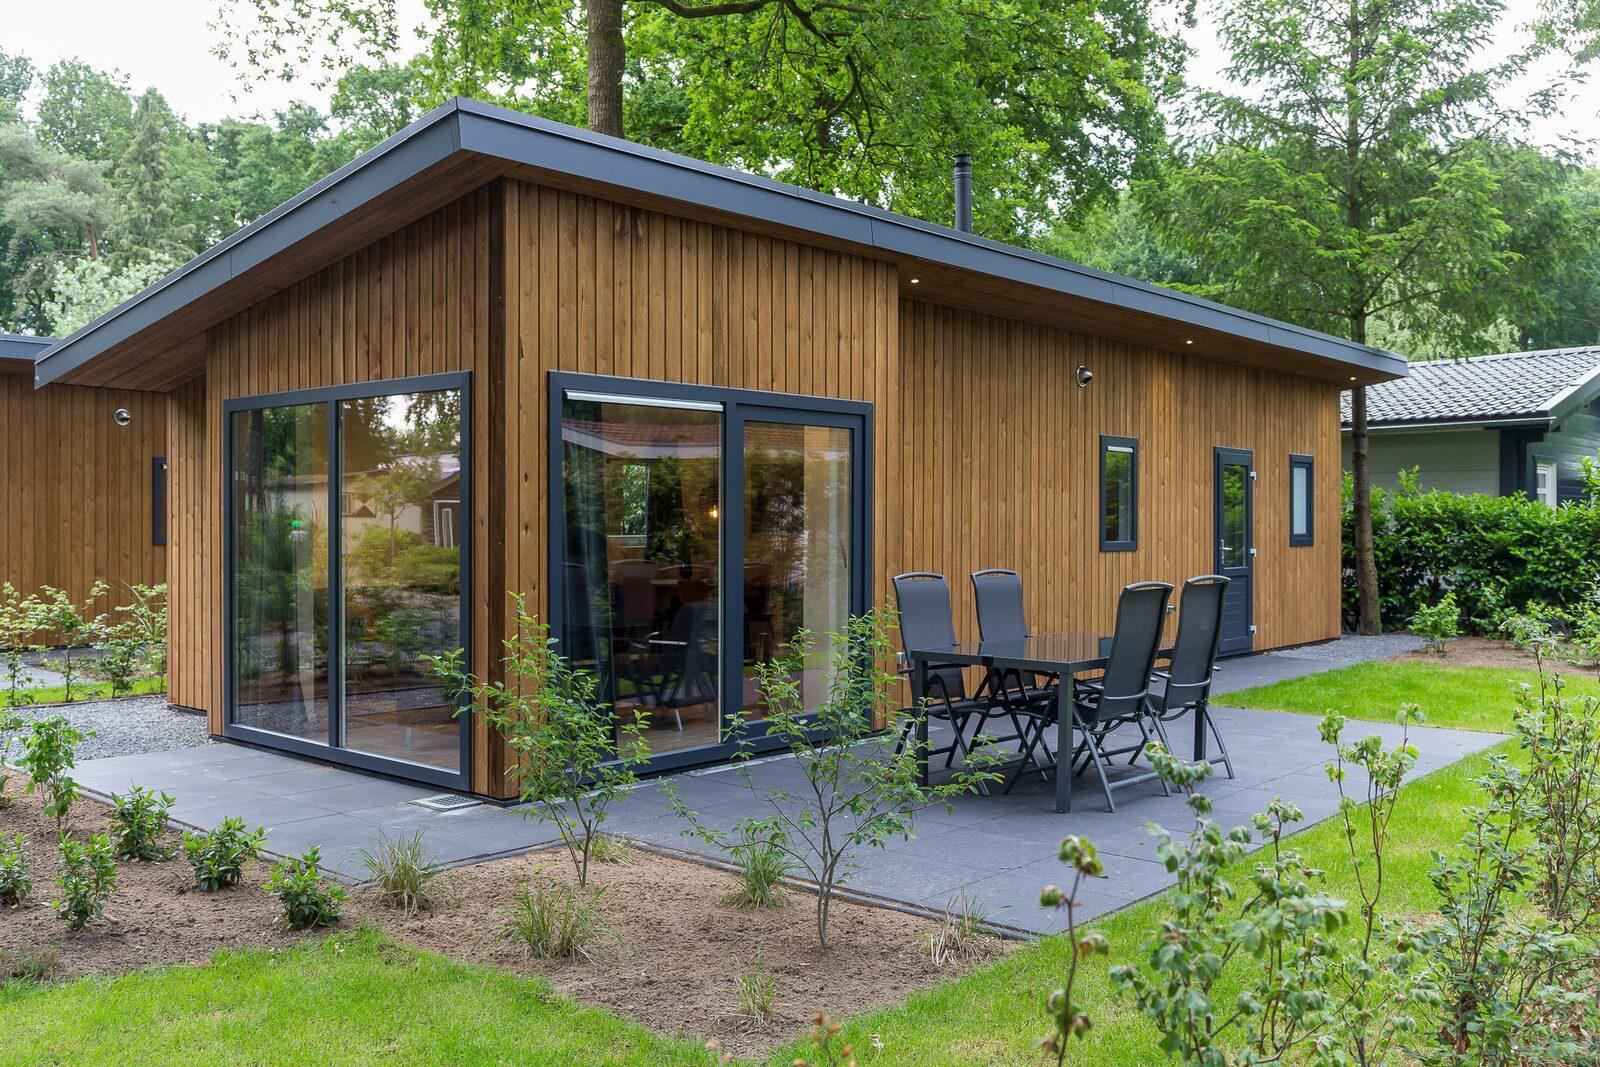 Wood Lodge Eco 6 personen Wellness